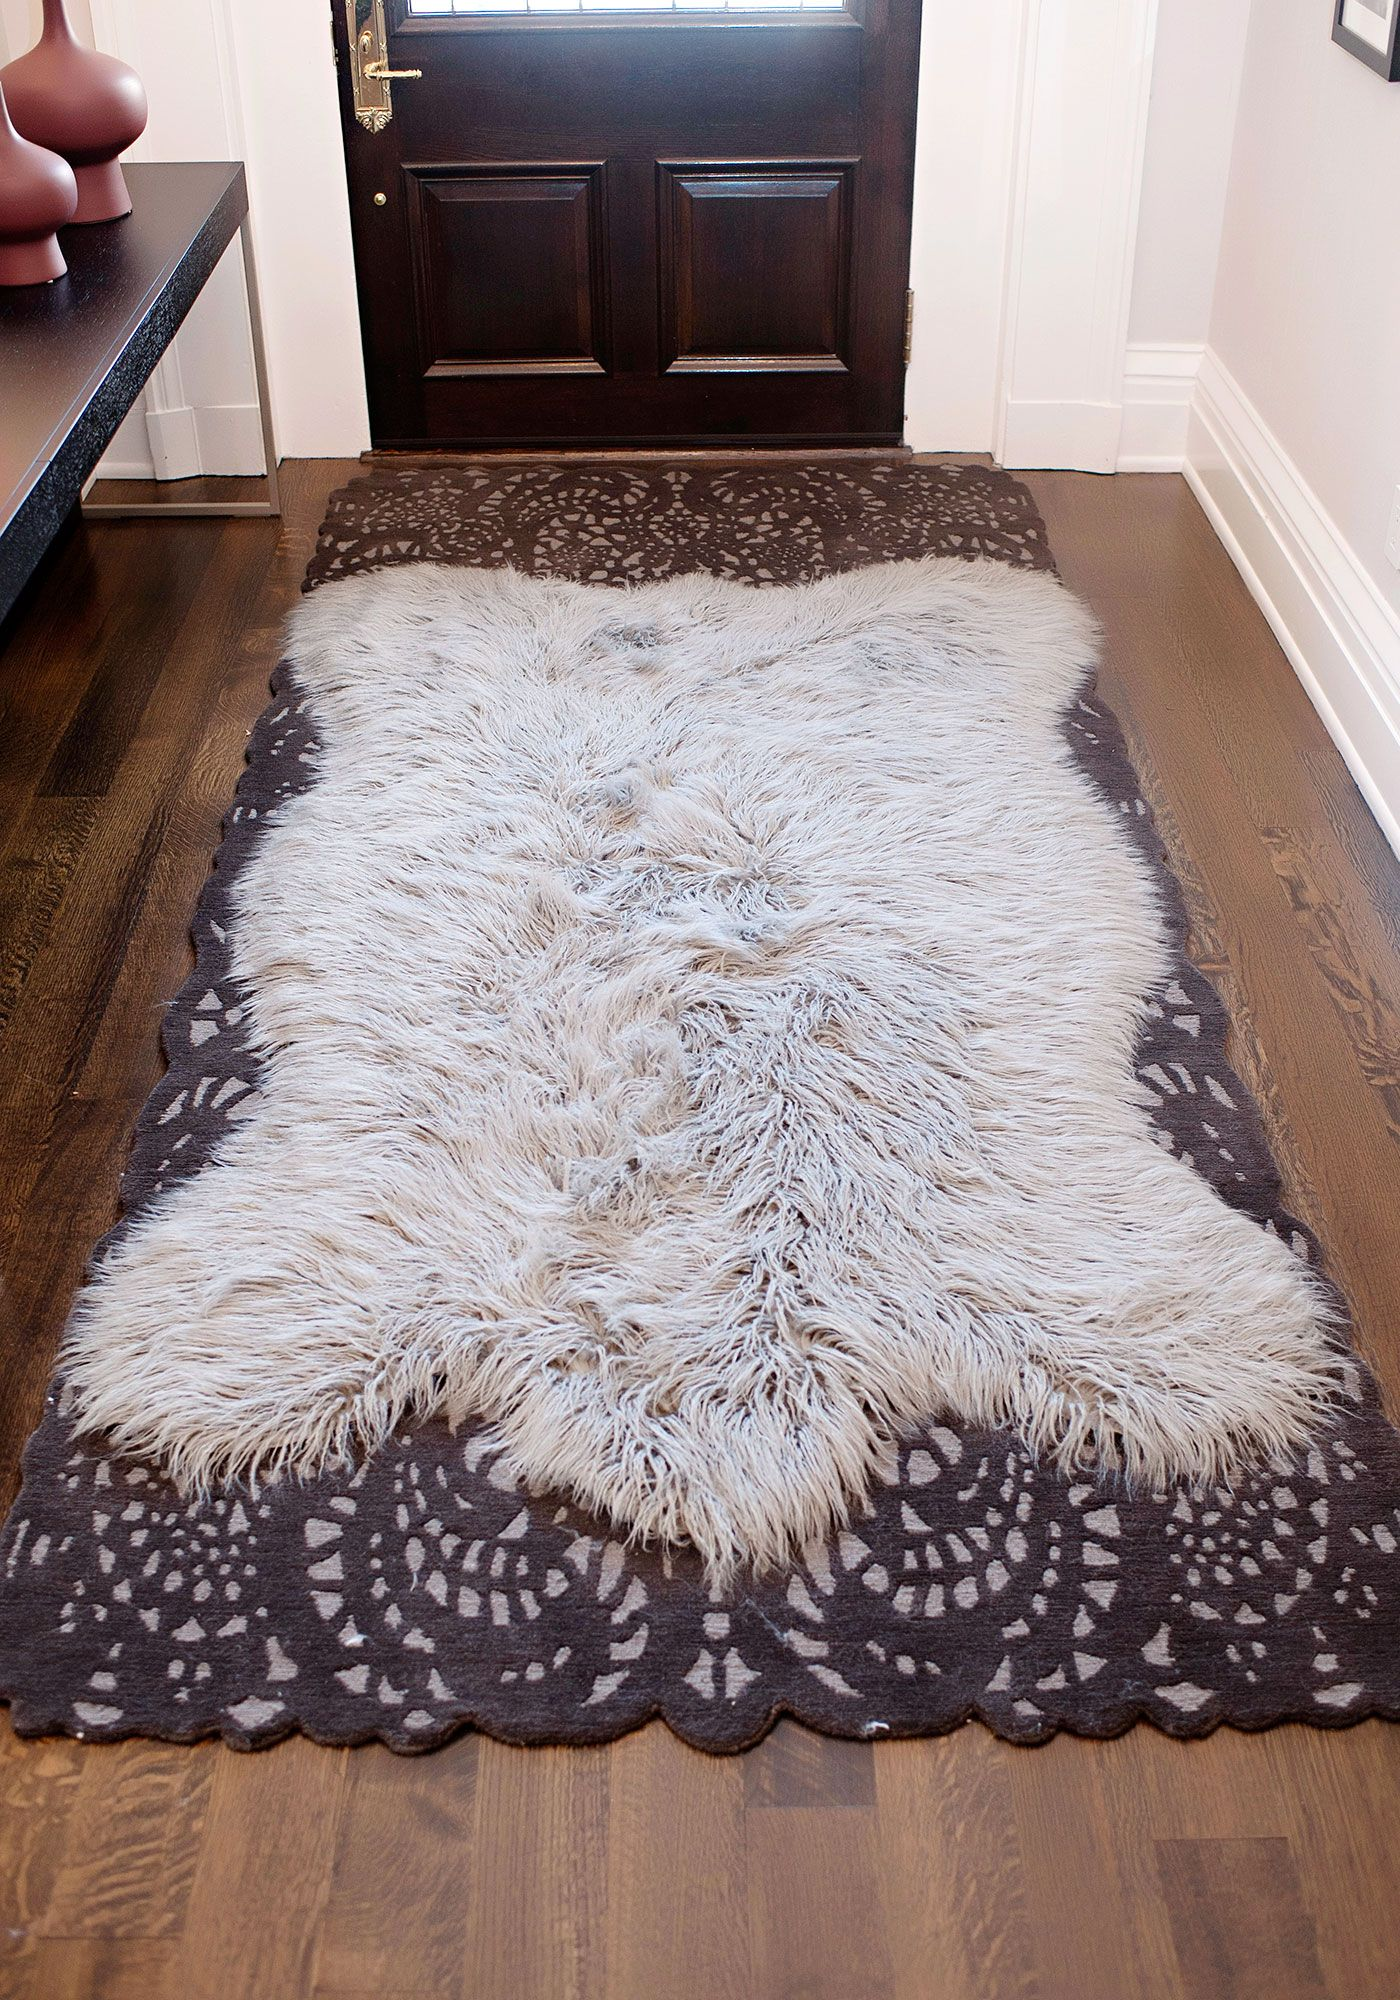 Grey Tibetan Lamb Faux Fur Area Rug Faux Fur Area Rug Faux Sheepskin Rug Rugs [ 2000 x 1400 Pixel ]